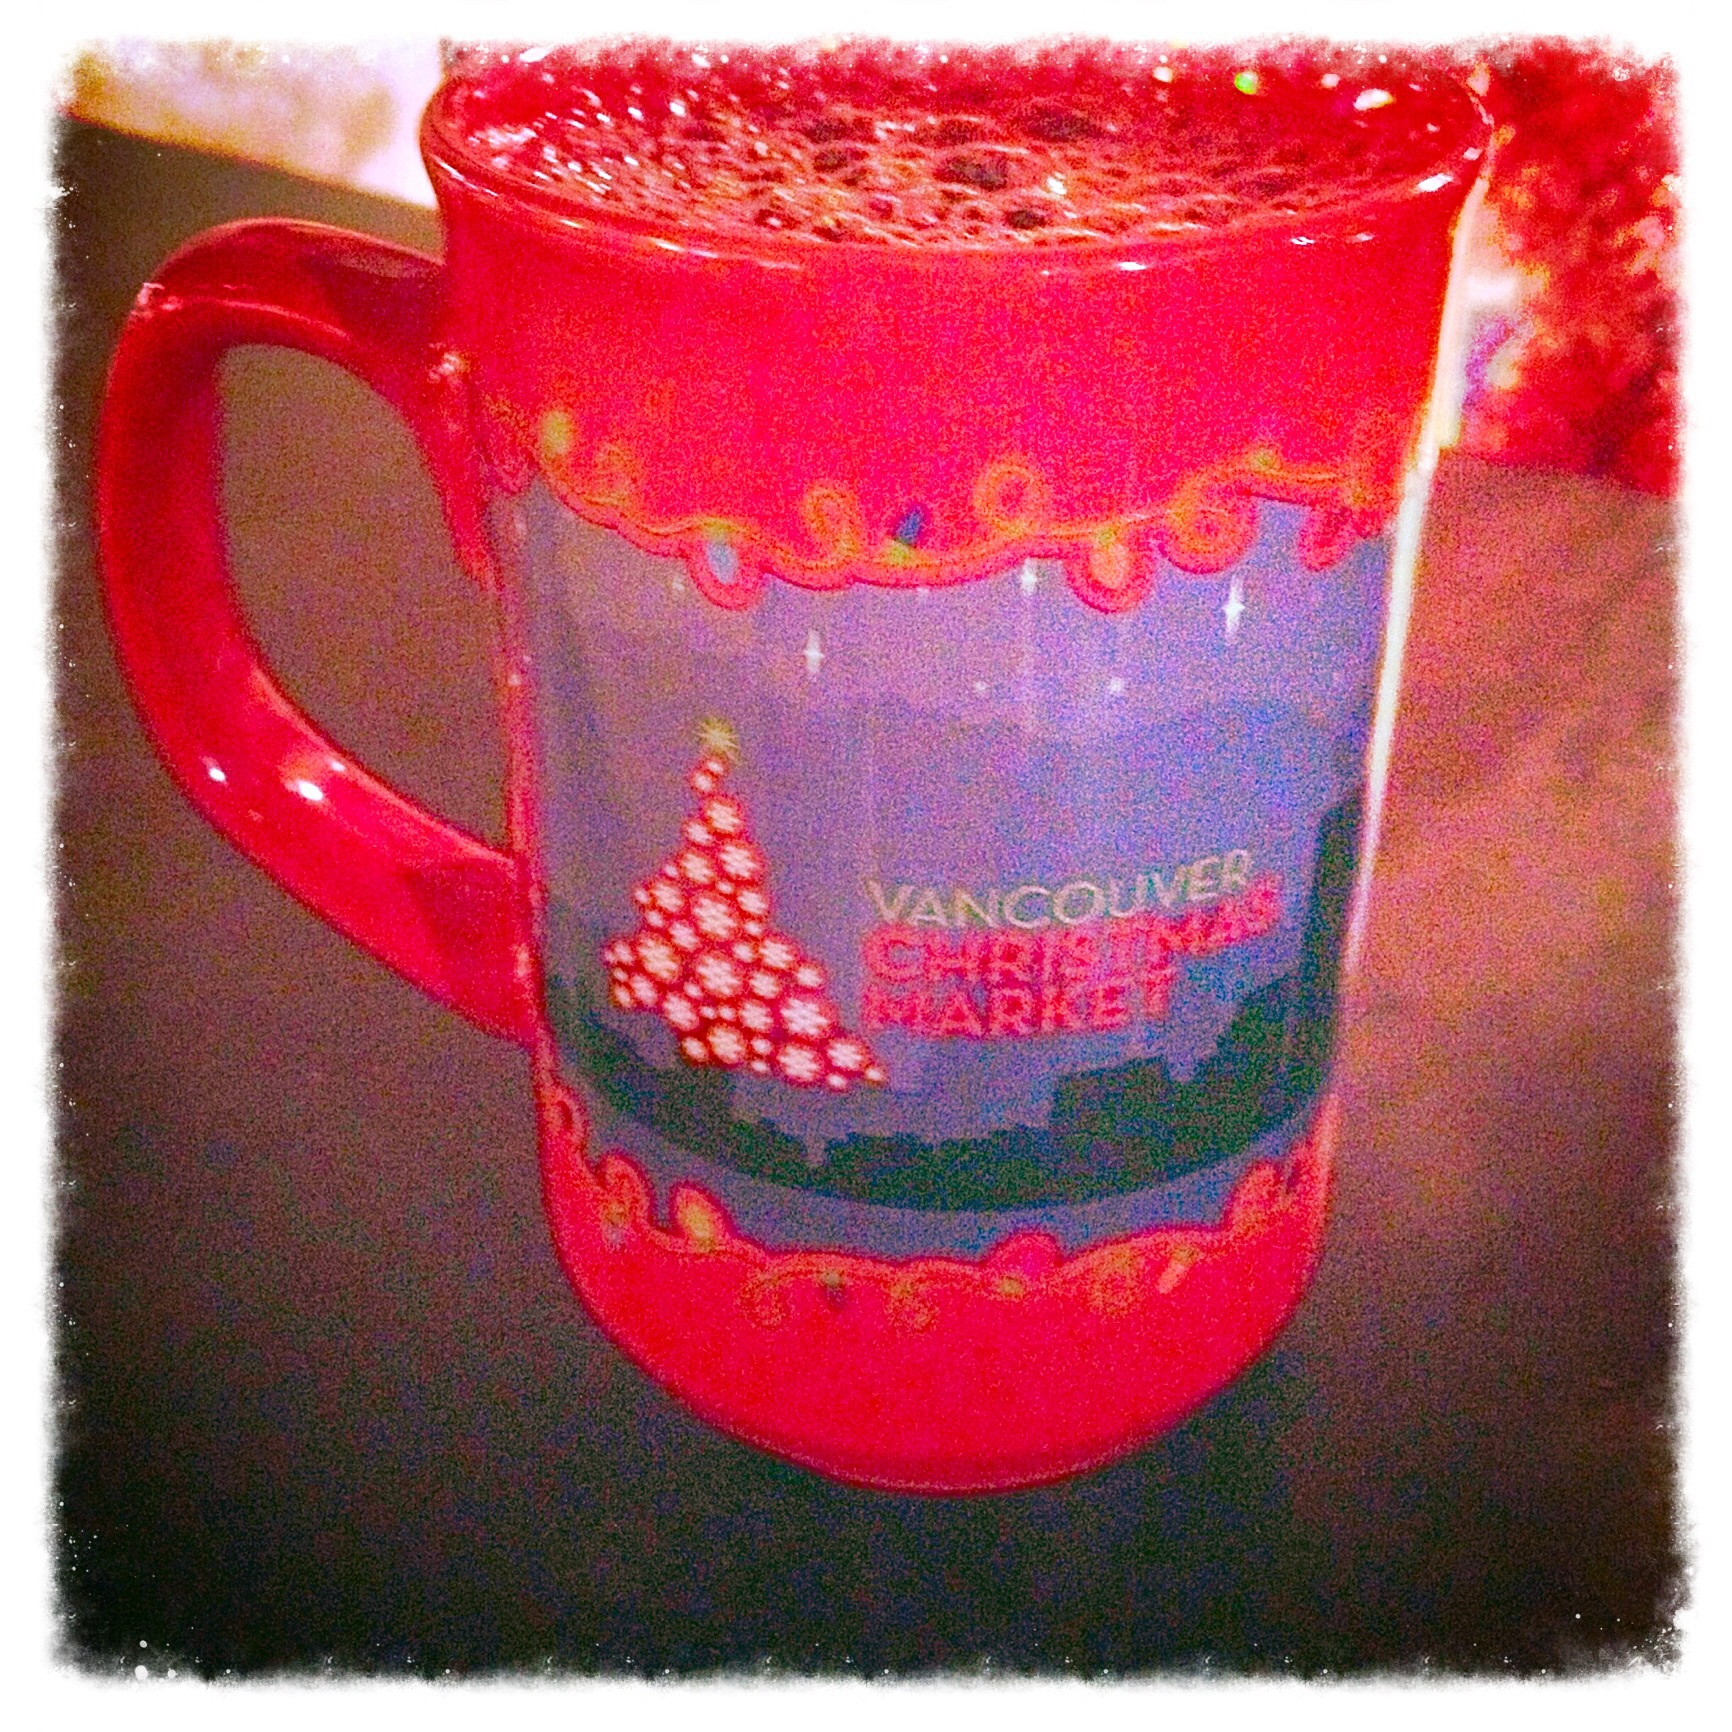 Vancouver Christmas Market Mug.A German Christmas Set In The Heart Of Vancouver Raincity